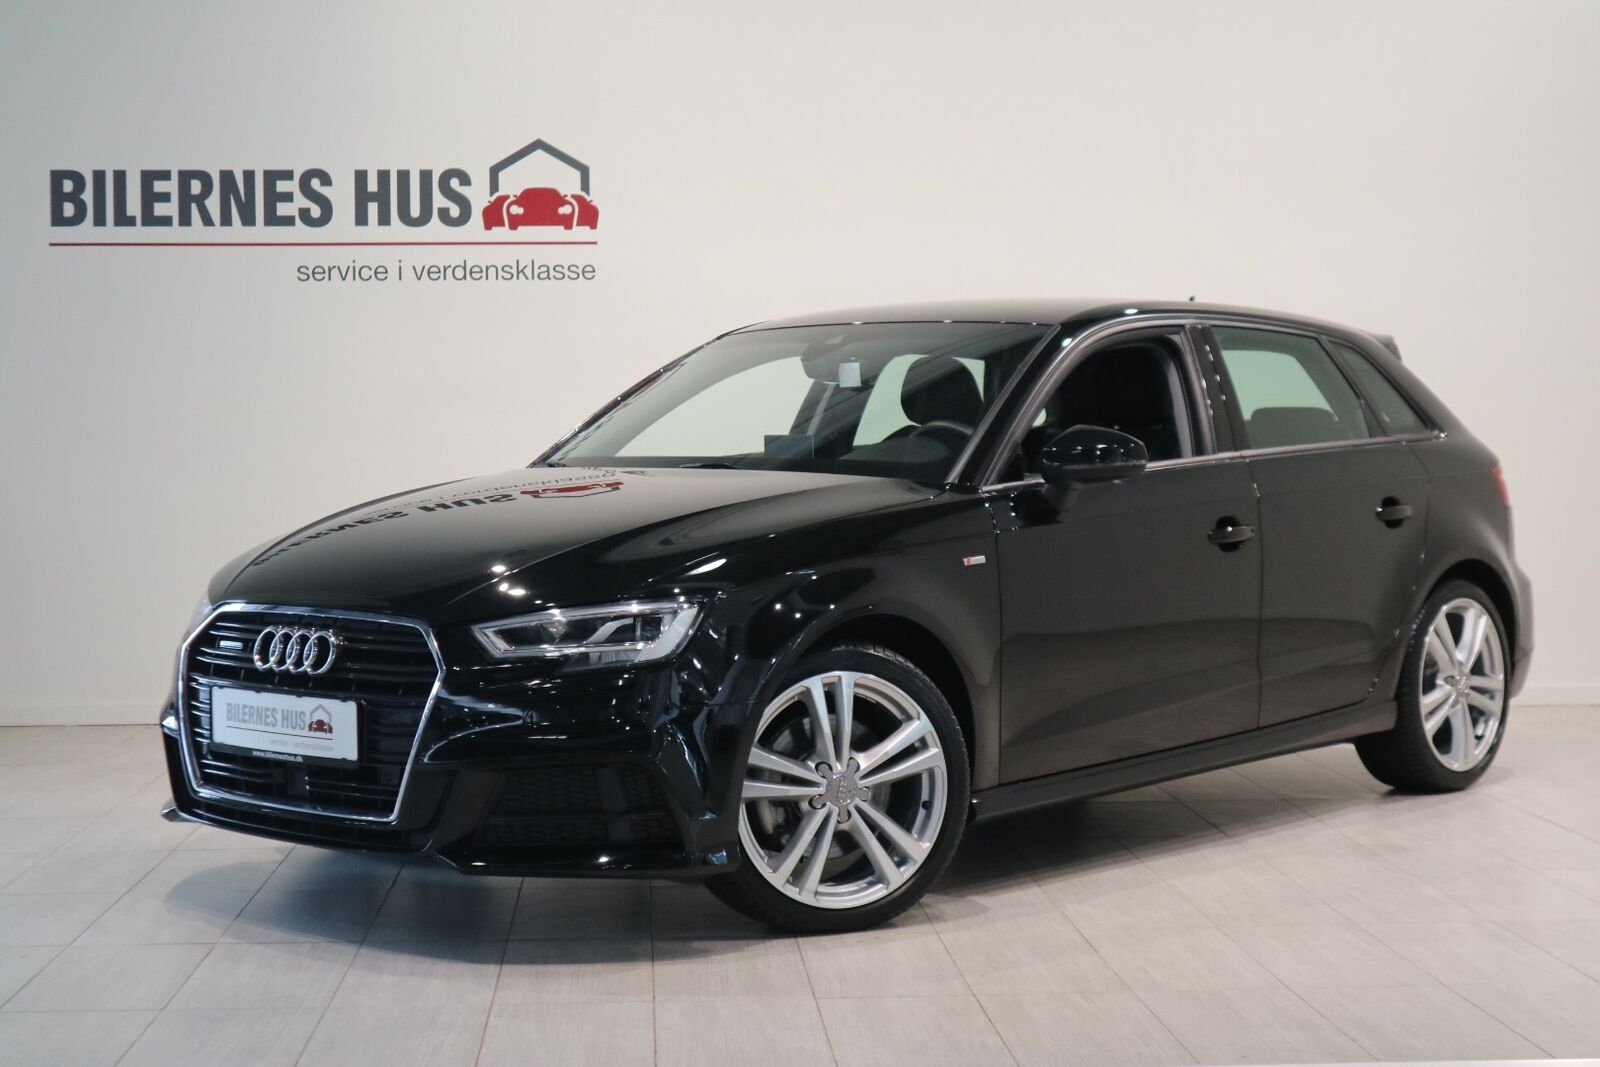 Audi A3 40 TFSi Limited+ Sportback quattro S-tr 5d - 344.900 kr.